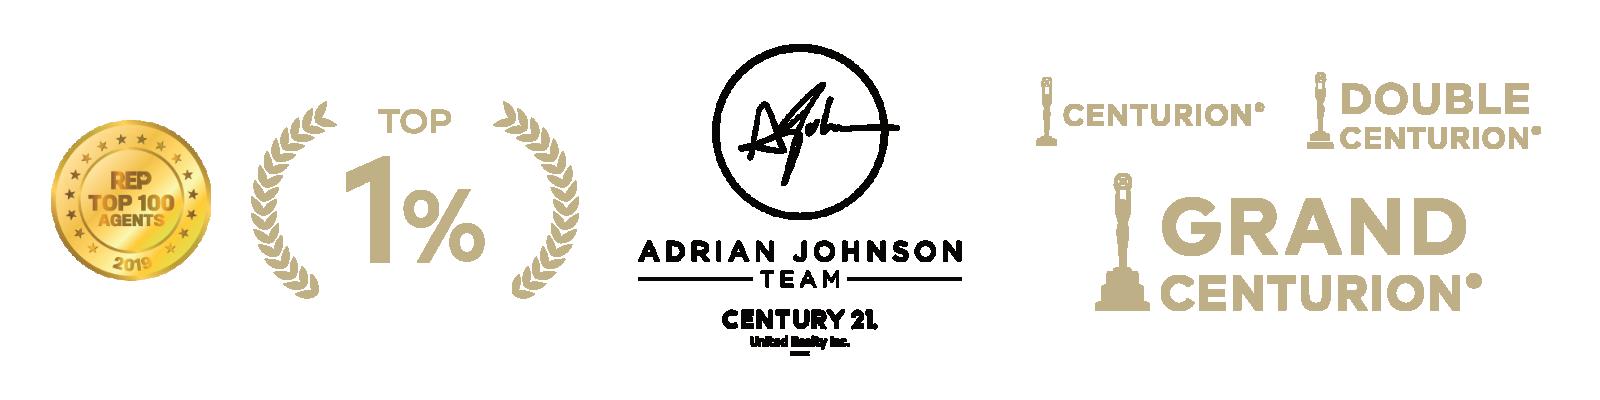 Adrian Johnson Awards